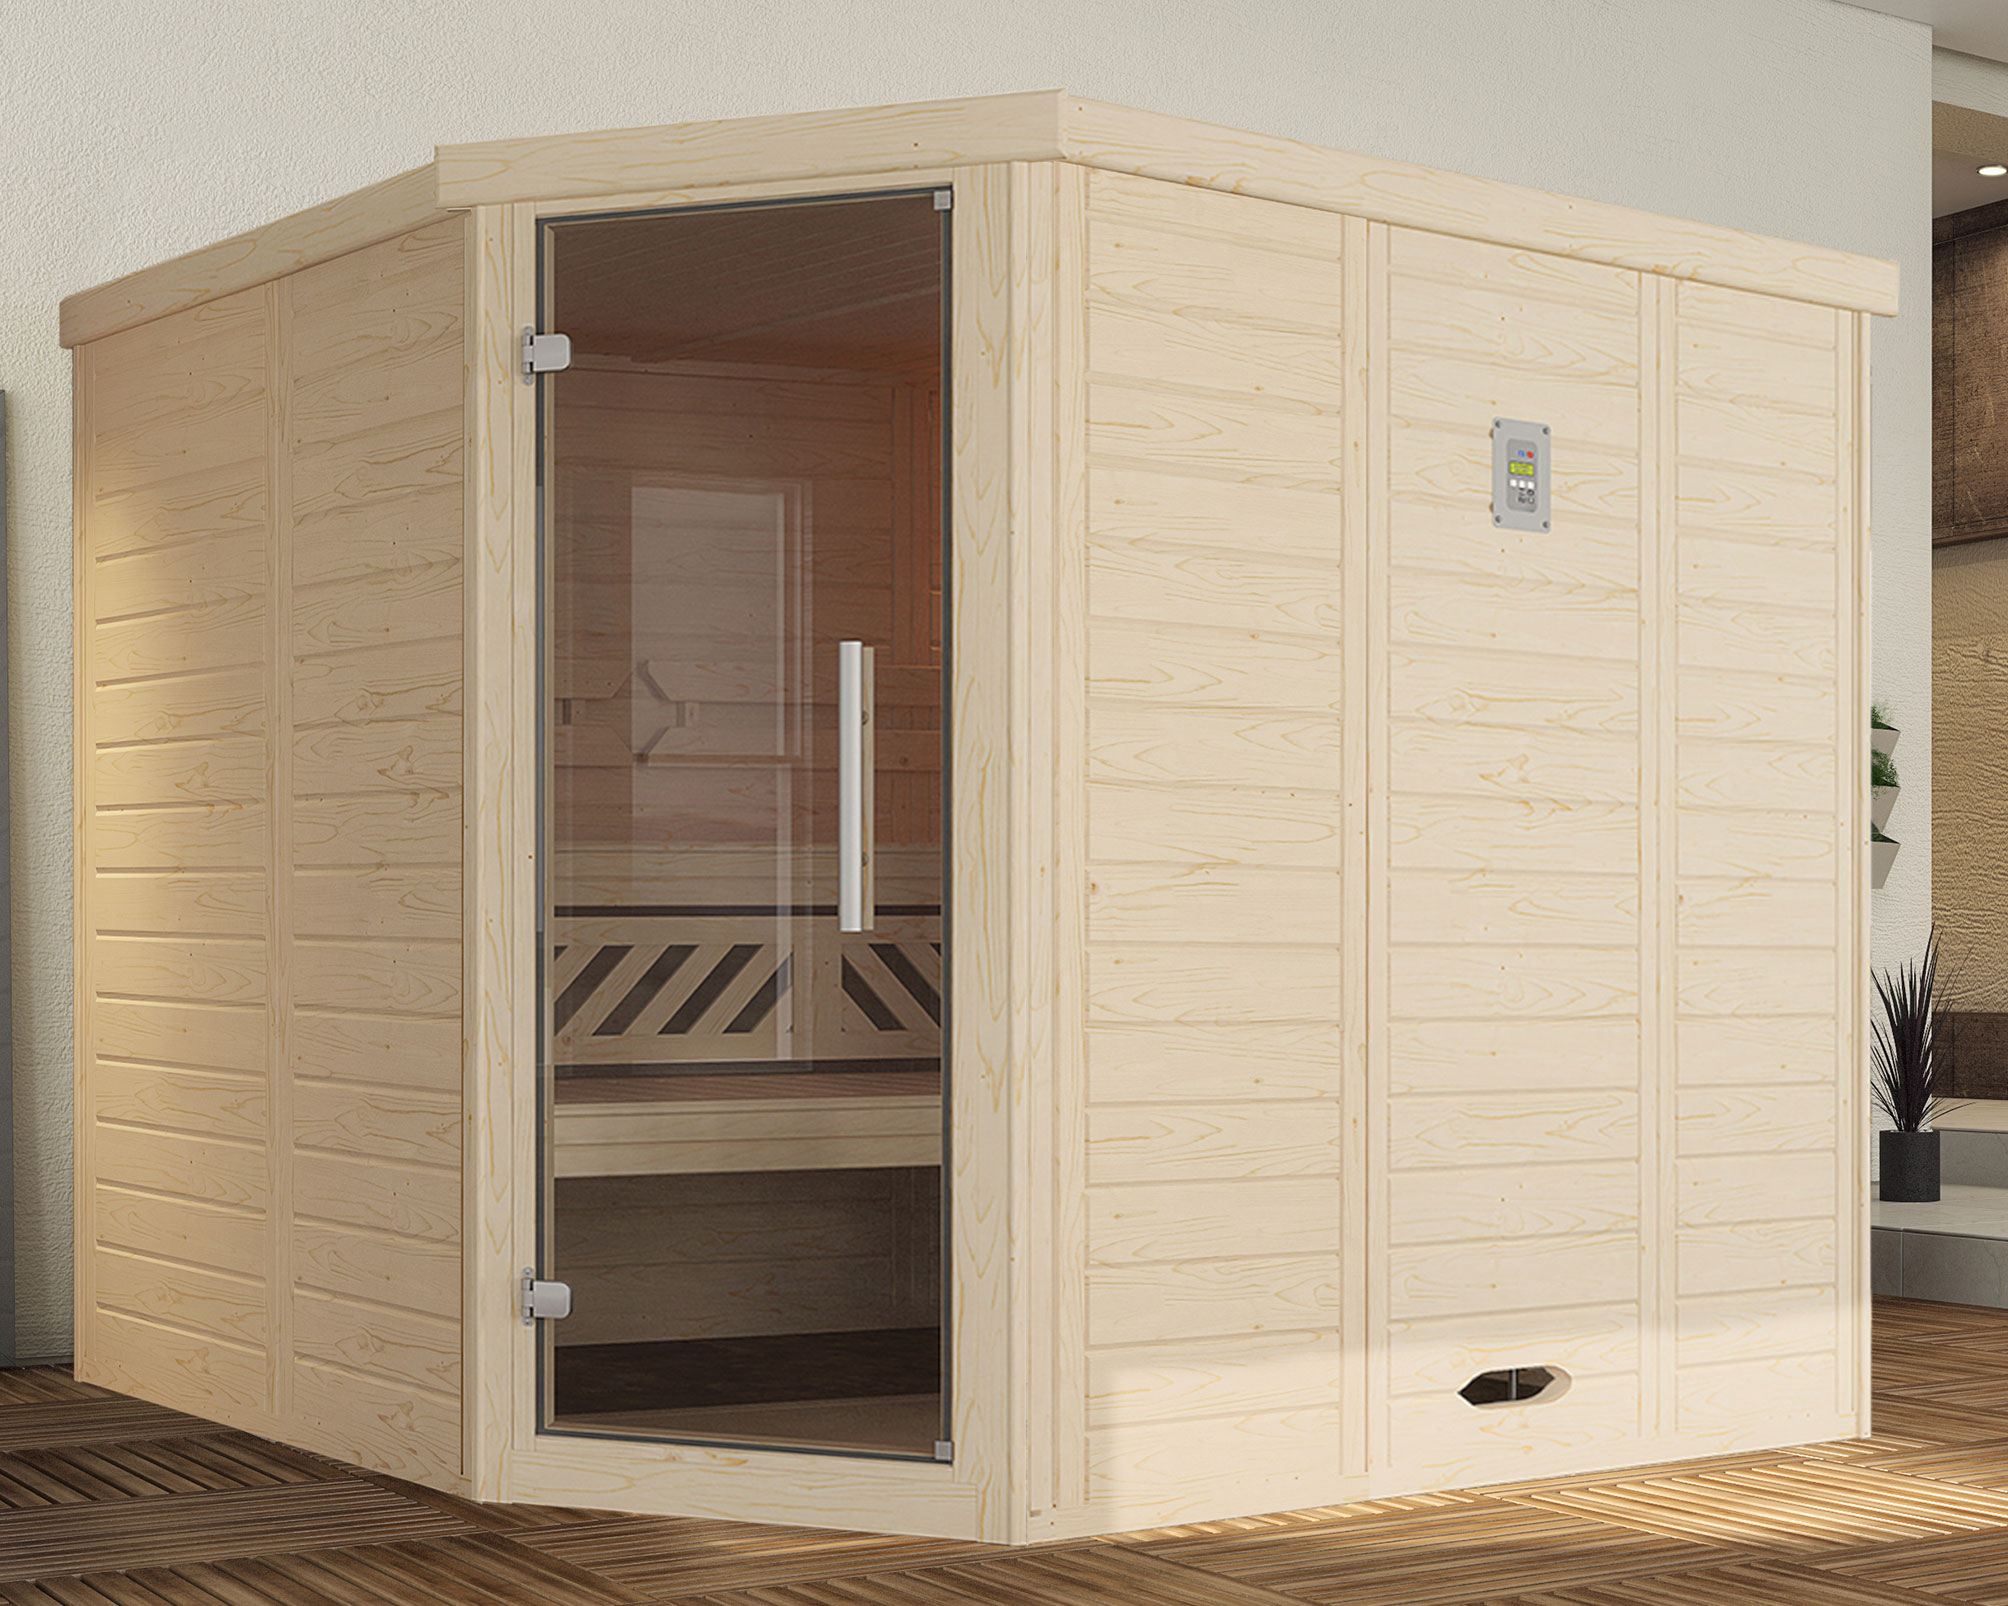 Weka Sauna Kemi Eck 2 45mm ohne Saunaofen + Komfortpaket + Glastür Bild 1